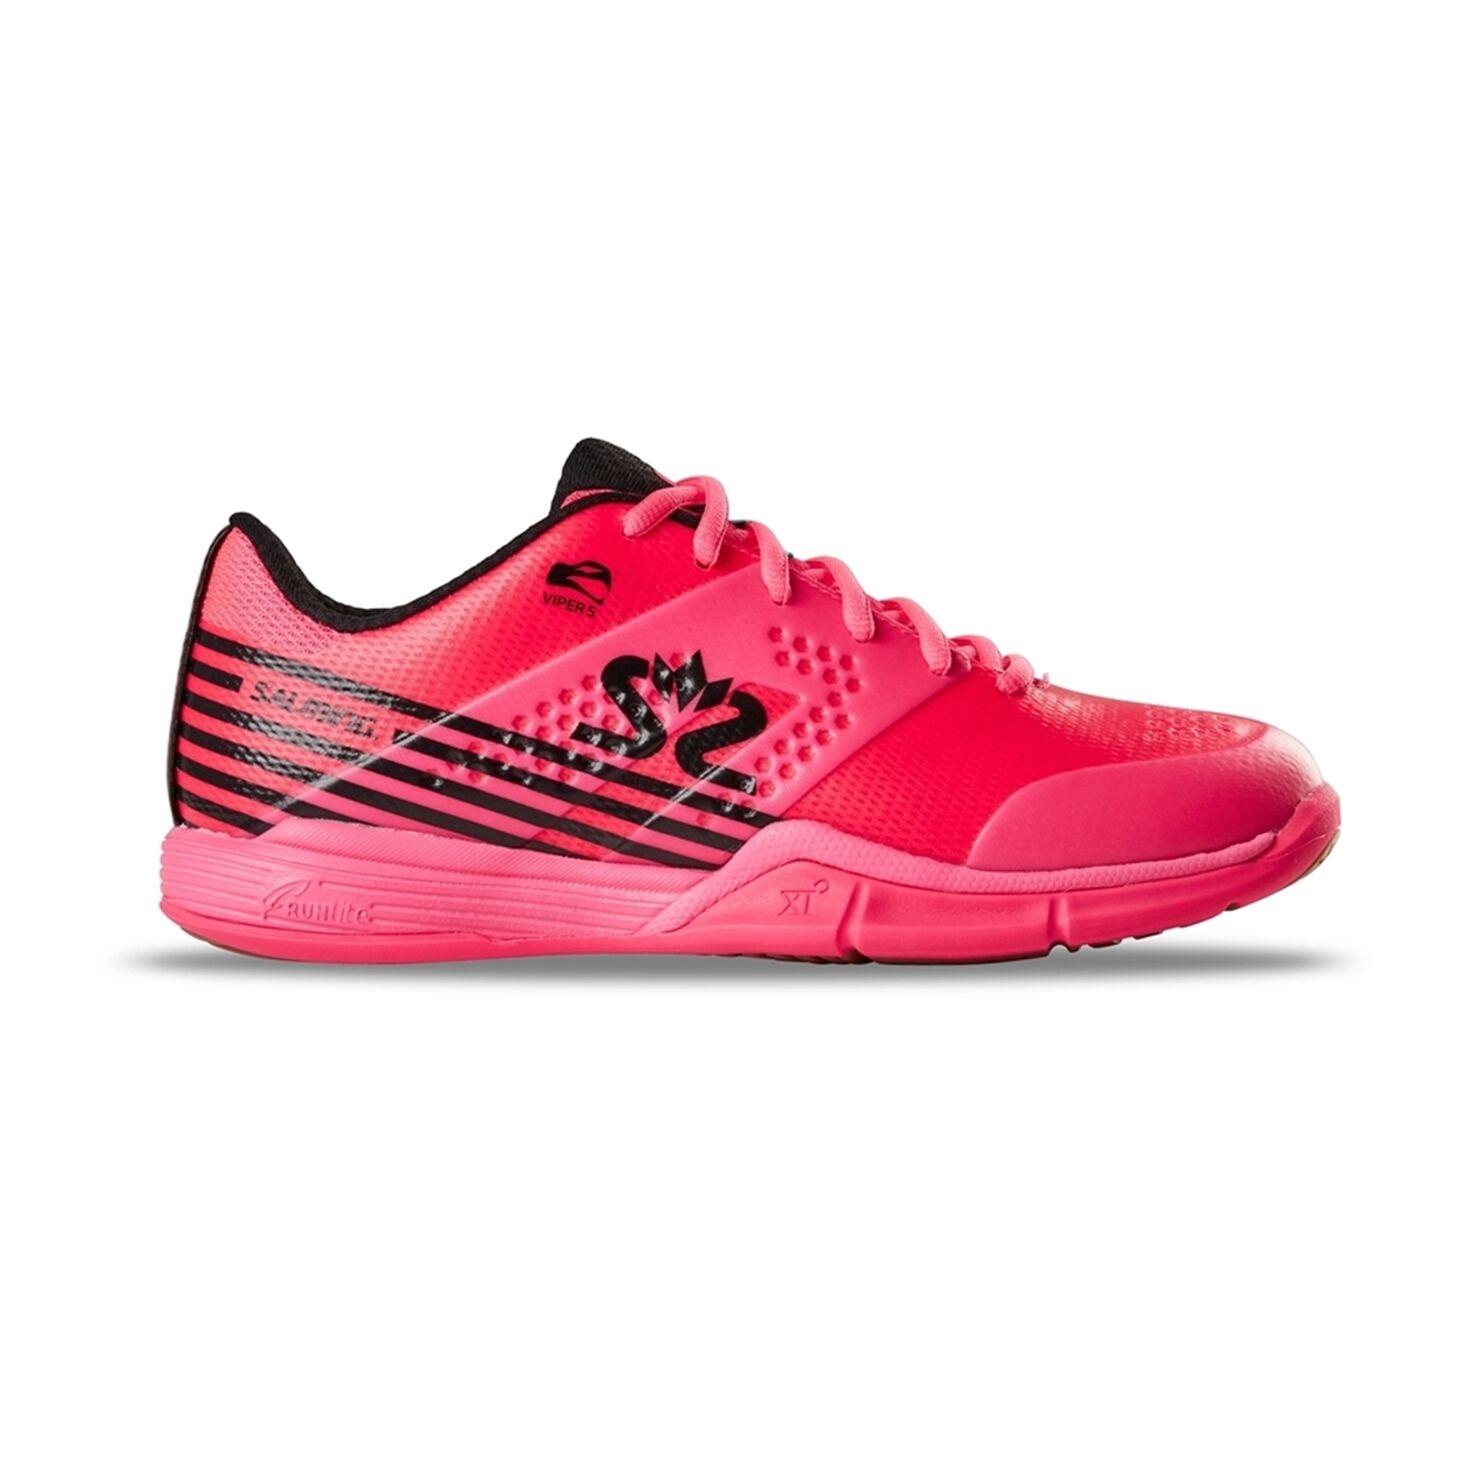 Salming Viper 5 Women Pink/Black 36